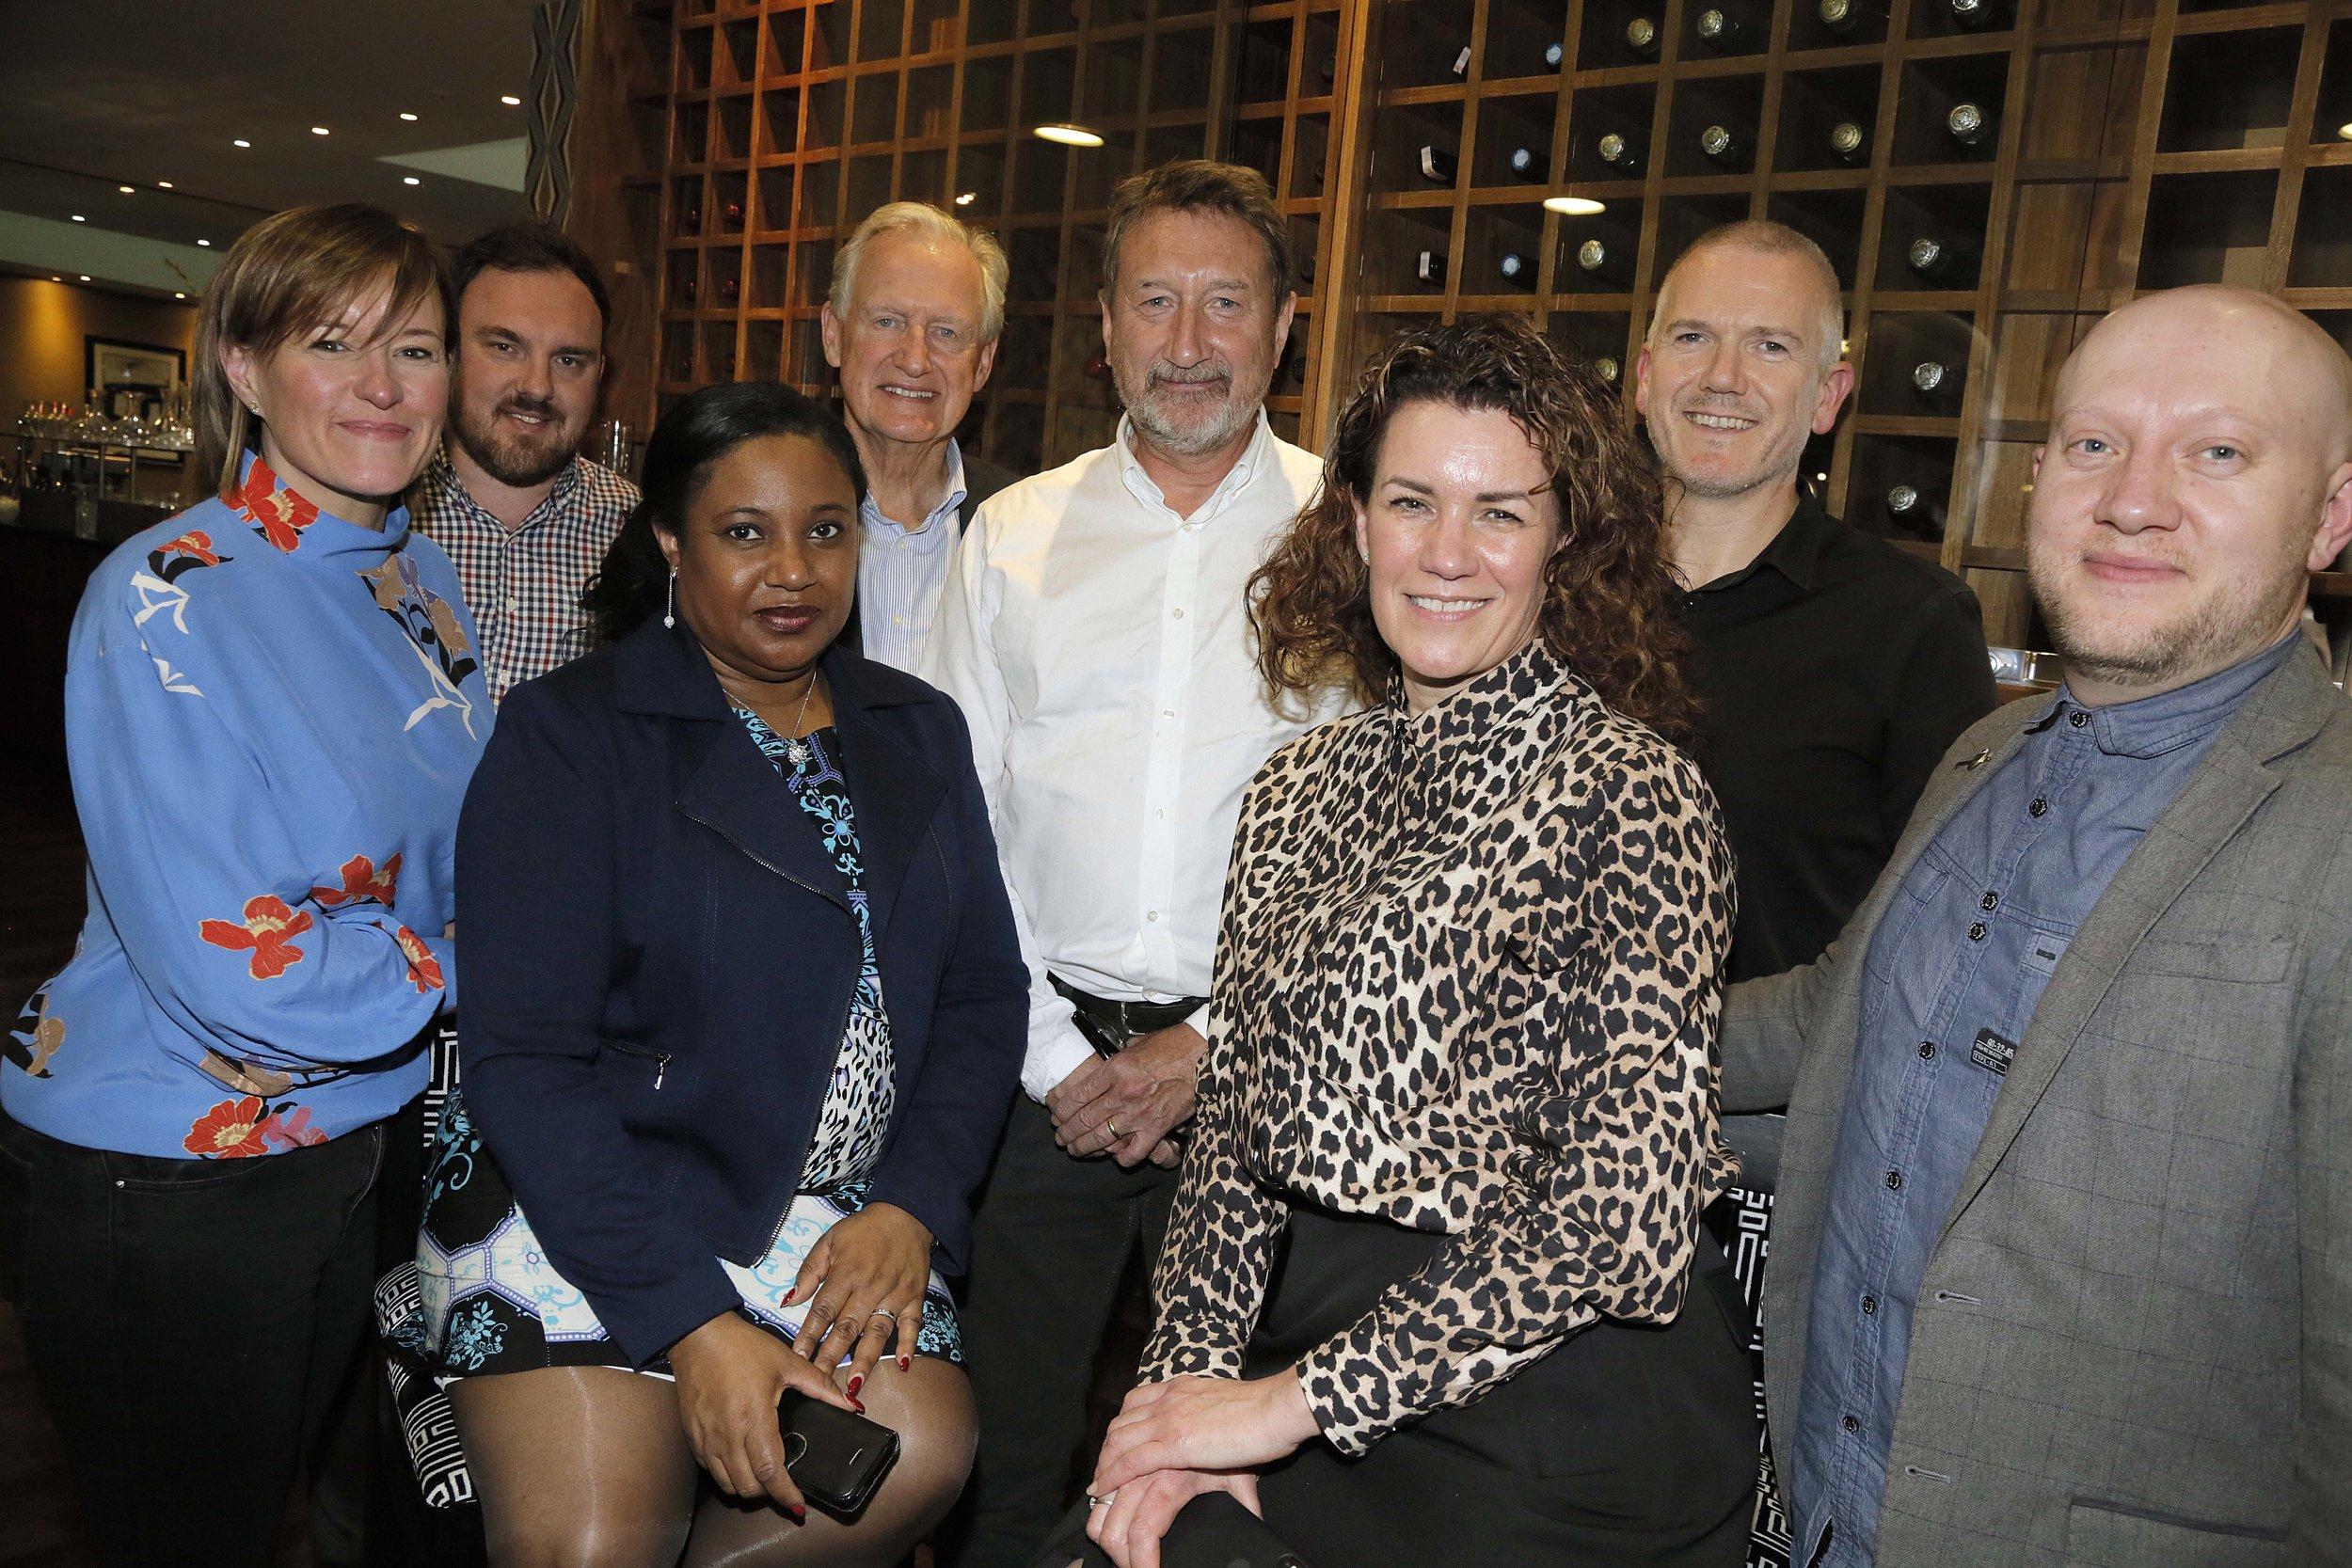 Kay Cadman, James Swinburne, Jaycinth Bailey, Bob Warman, Steven Knight, Dawn Roberts, Steve Gracey, Jack Brabant.jpg